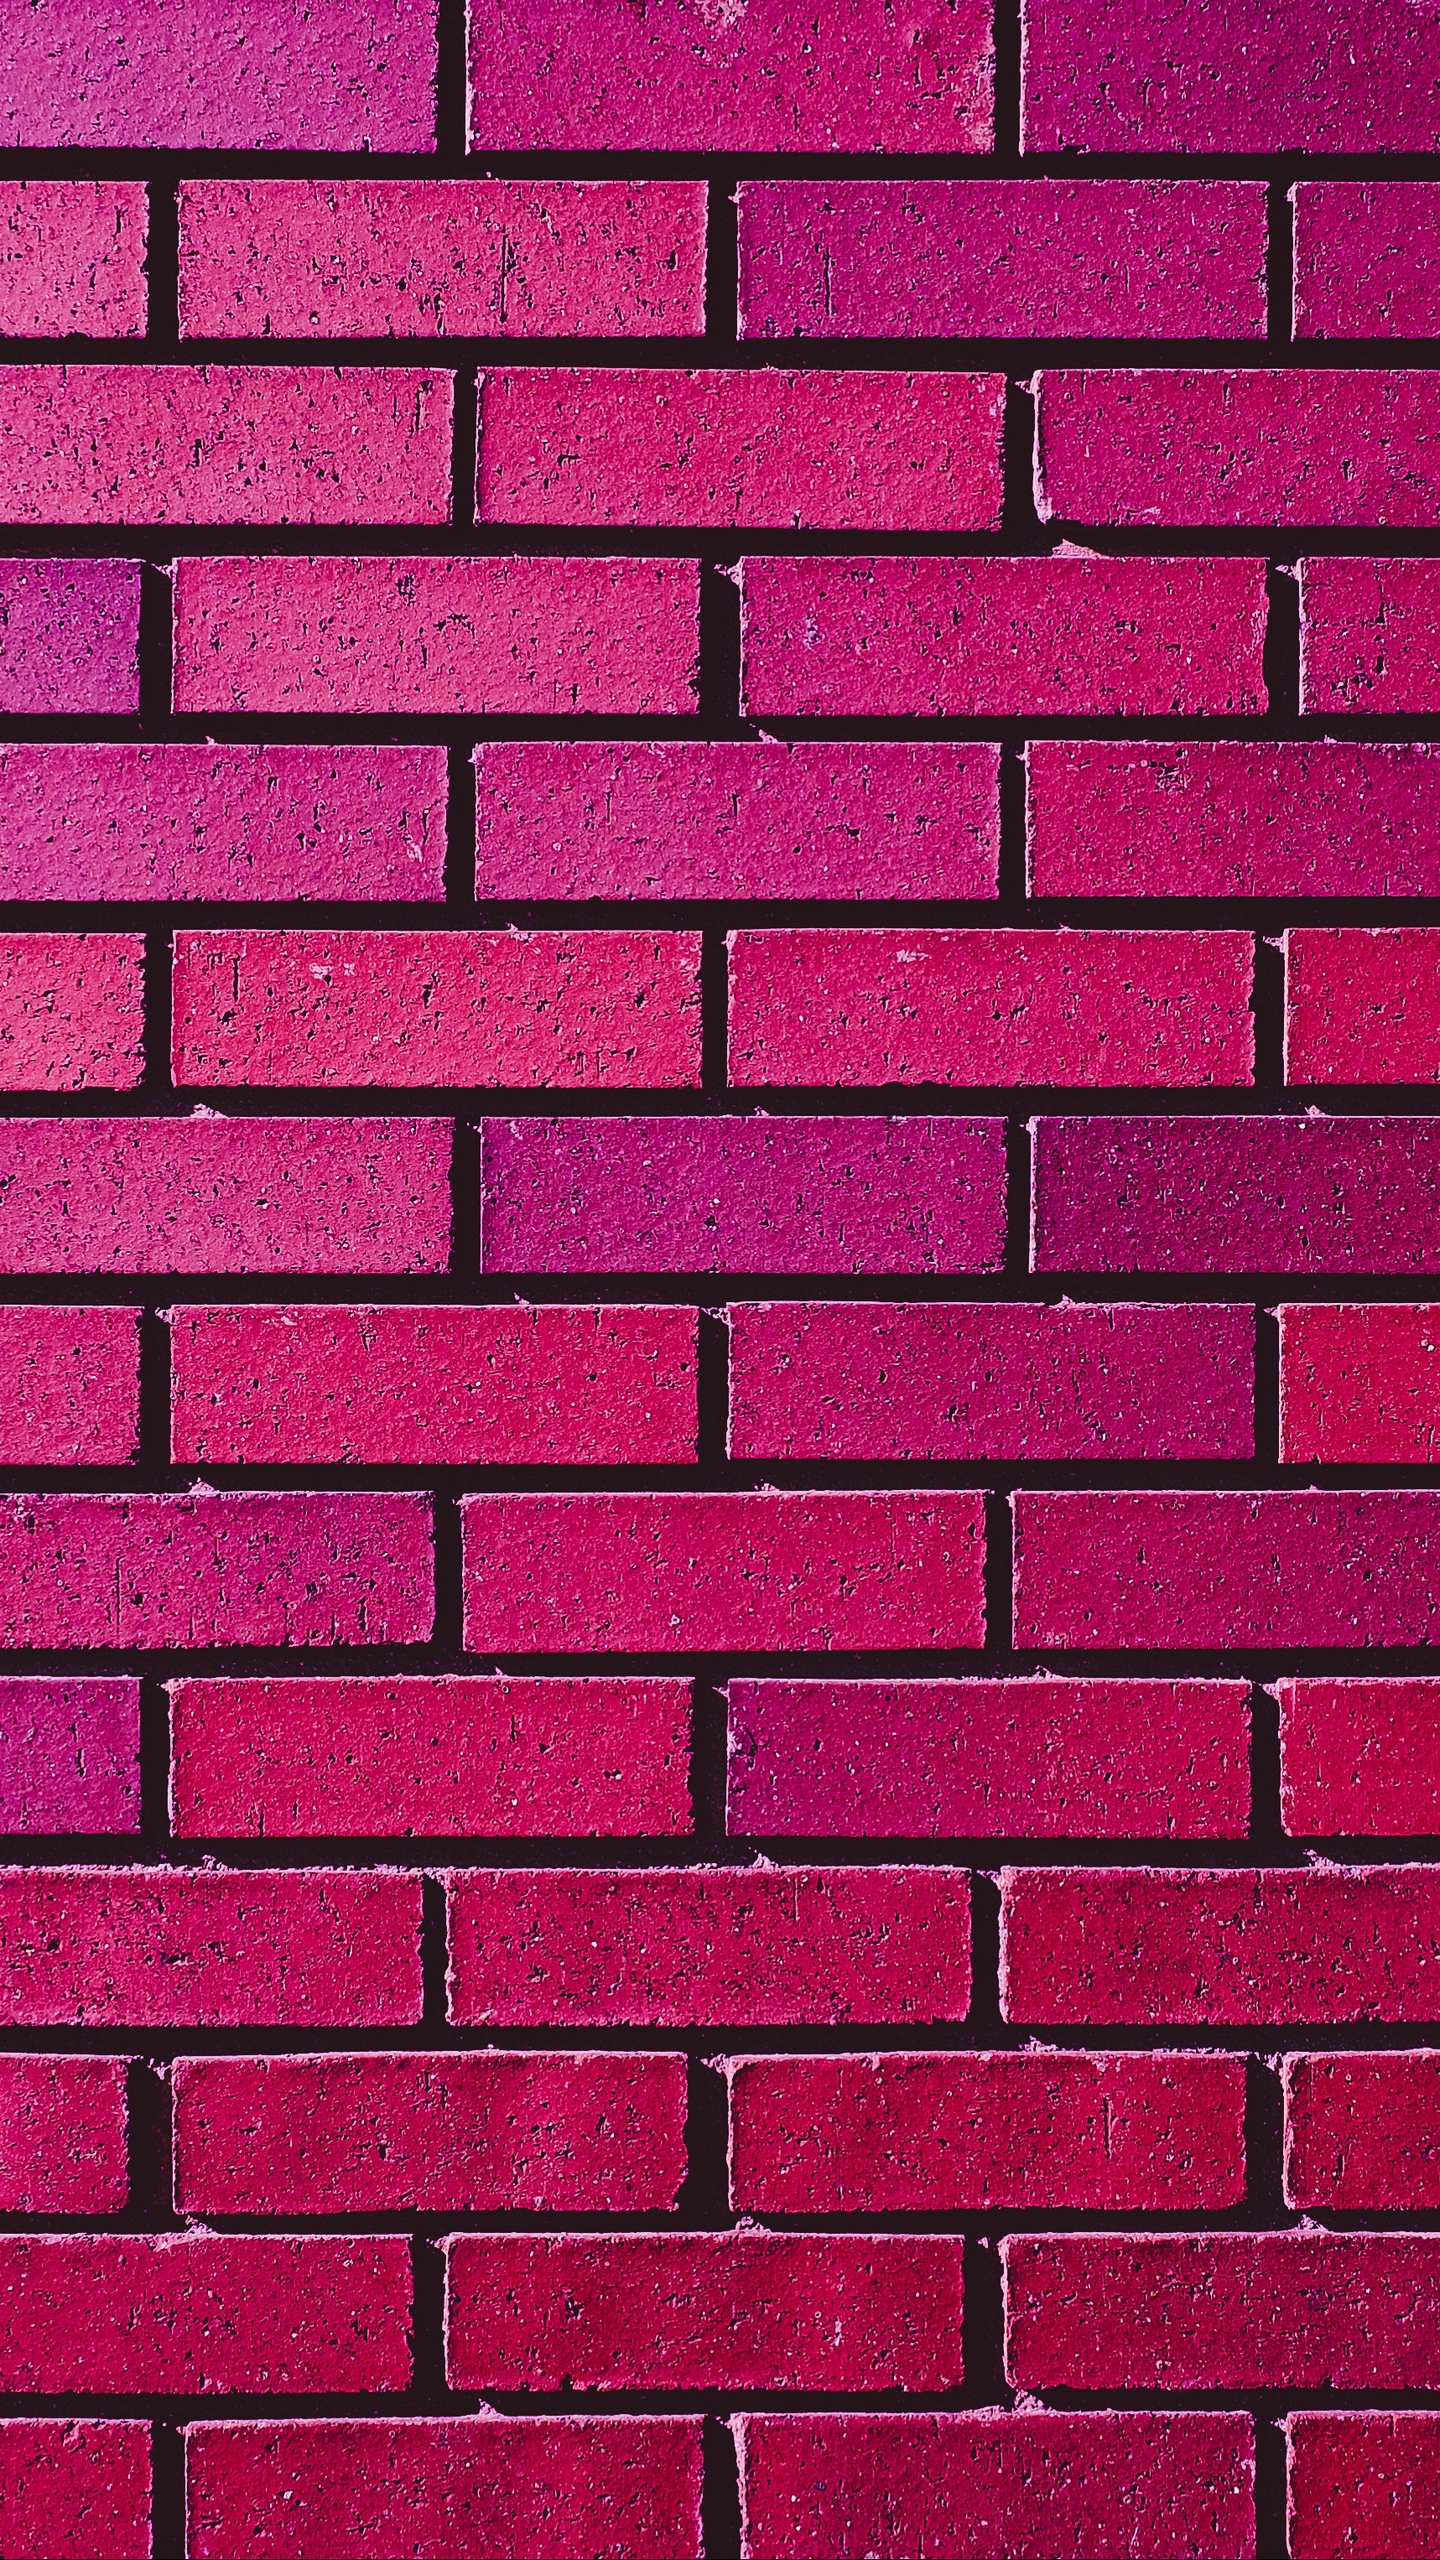 Wallpaper Wall, Brick, Texture, Pink, Purple, Shades - Iphone Brick Wall Wallpaper Hd - HD Wallpaper